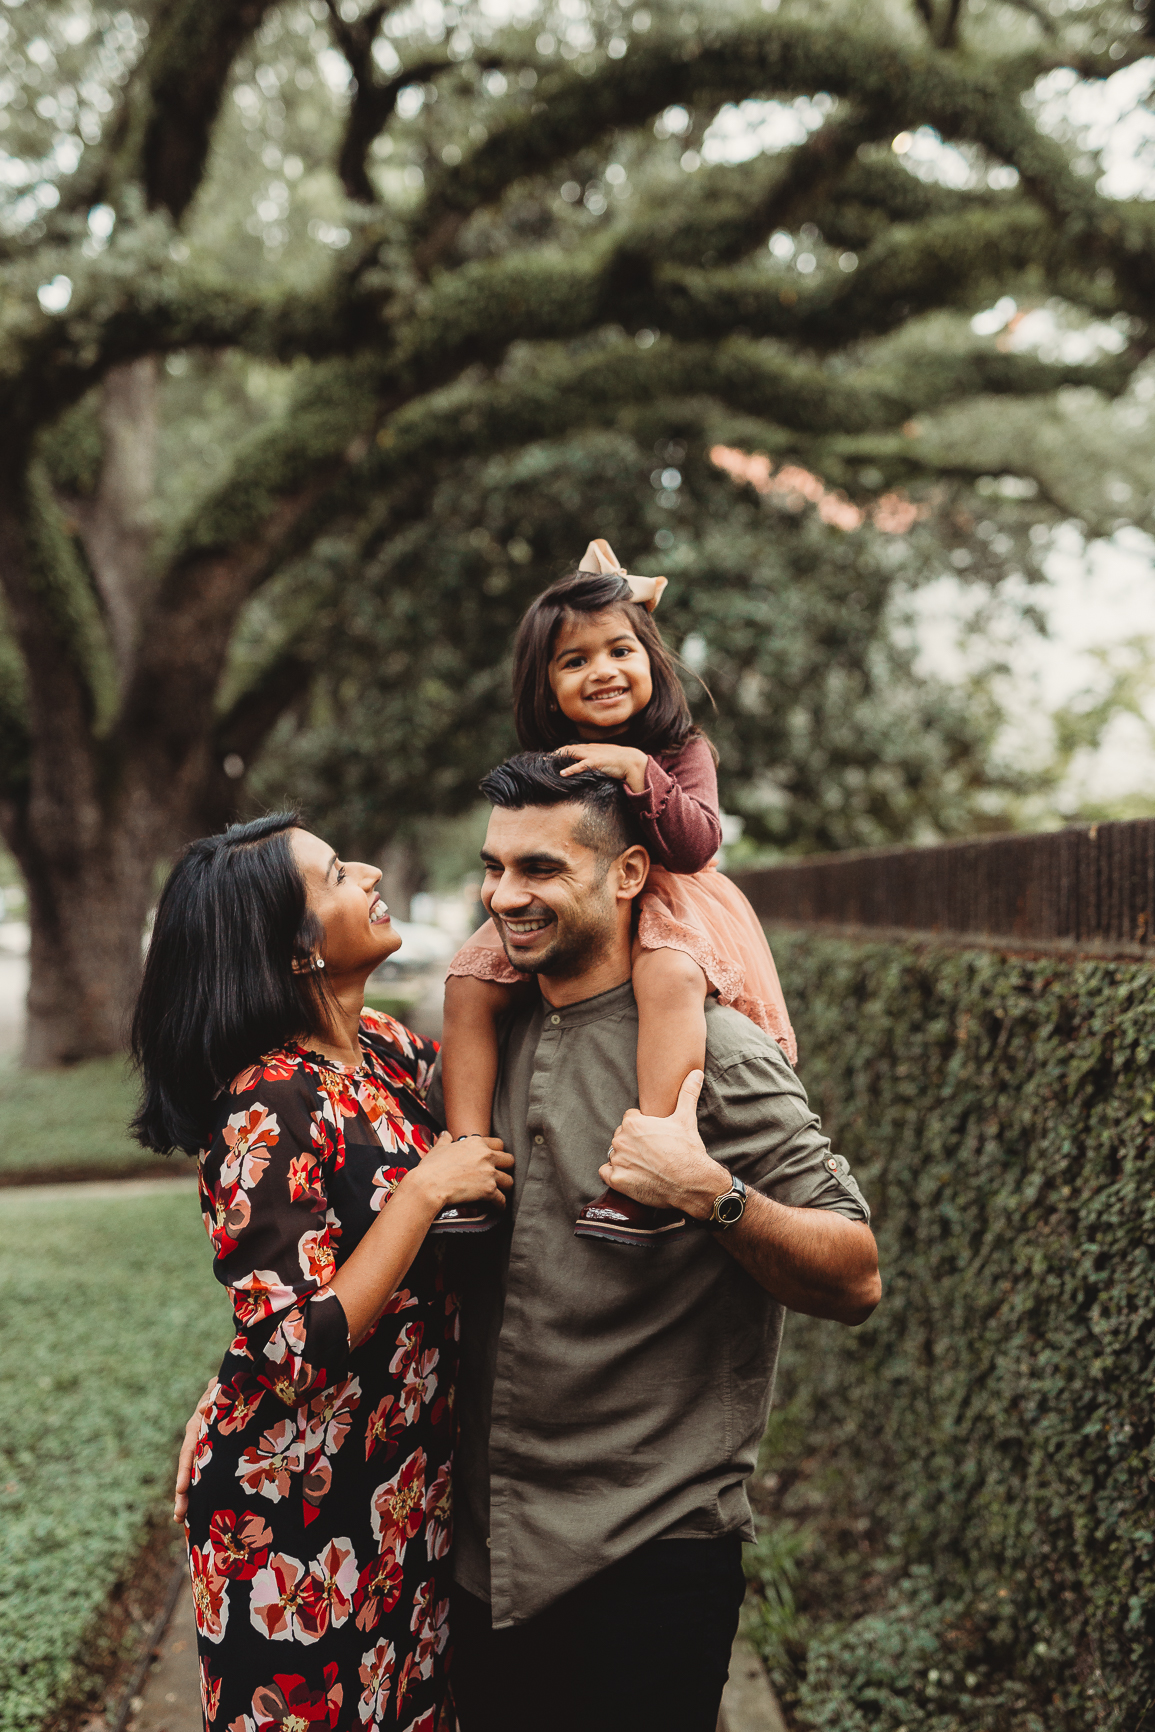 Jesrani-Family-Gallery-Kali-Mikelle-38.jpg